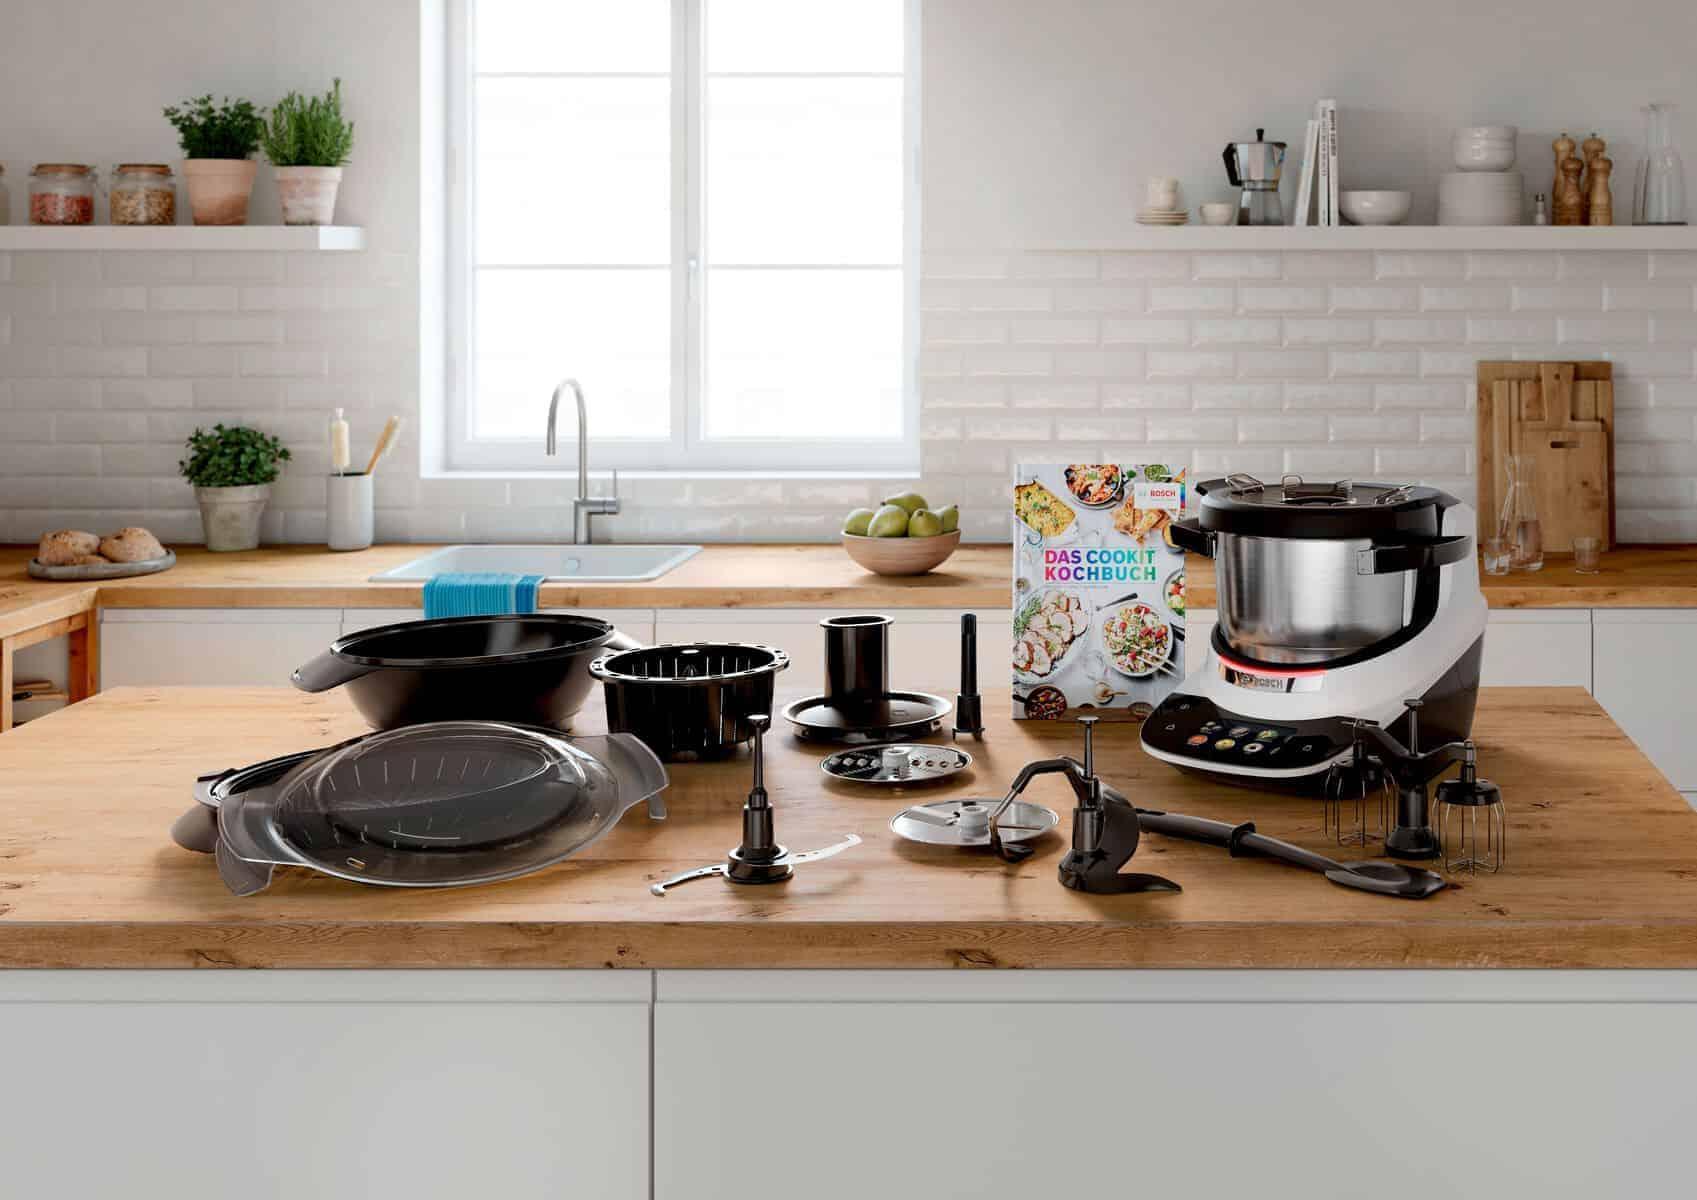 Bosch Cookit – Foto PR